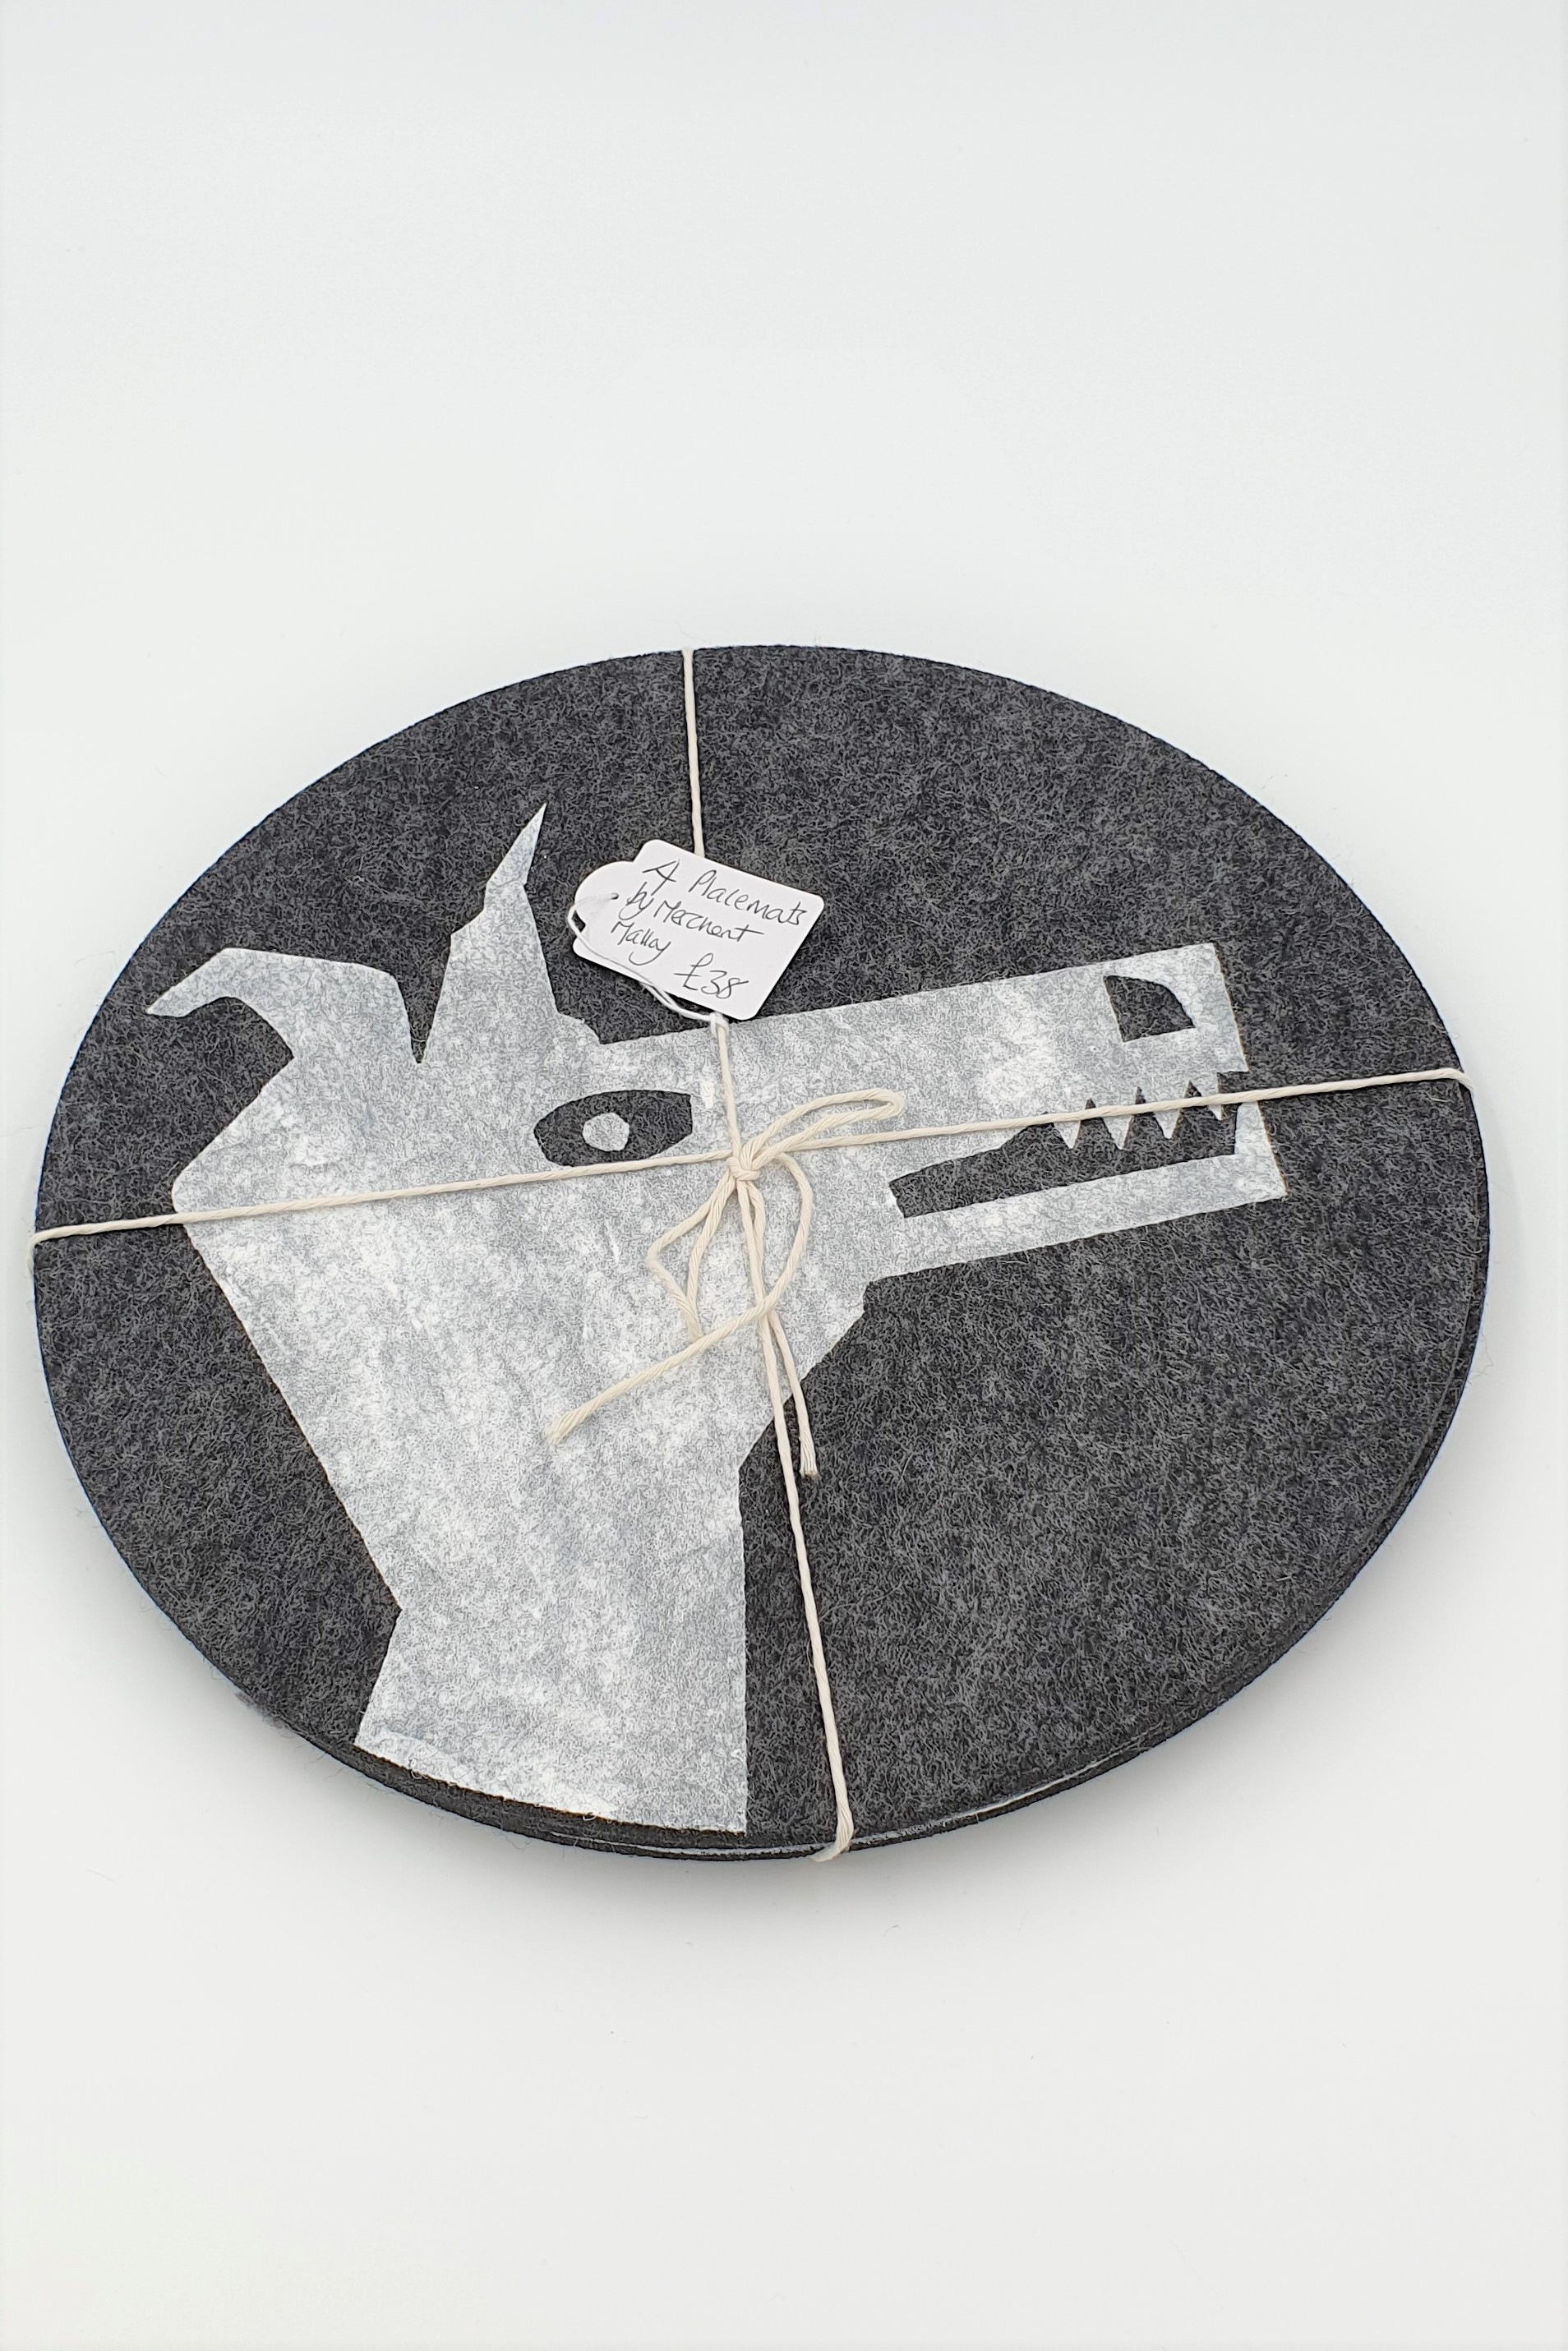 Merchant Malloy  Artic fox placemats